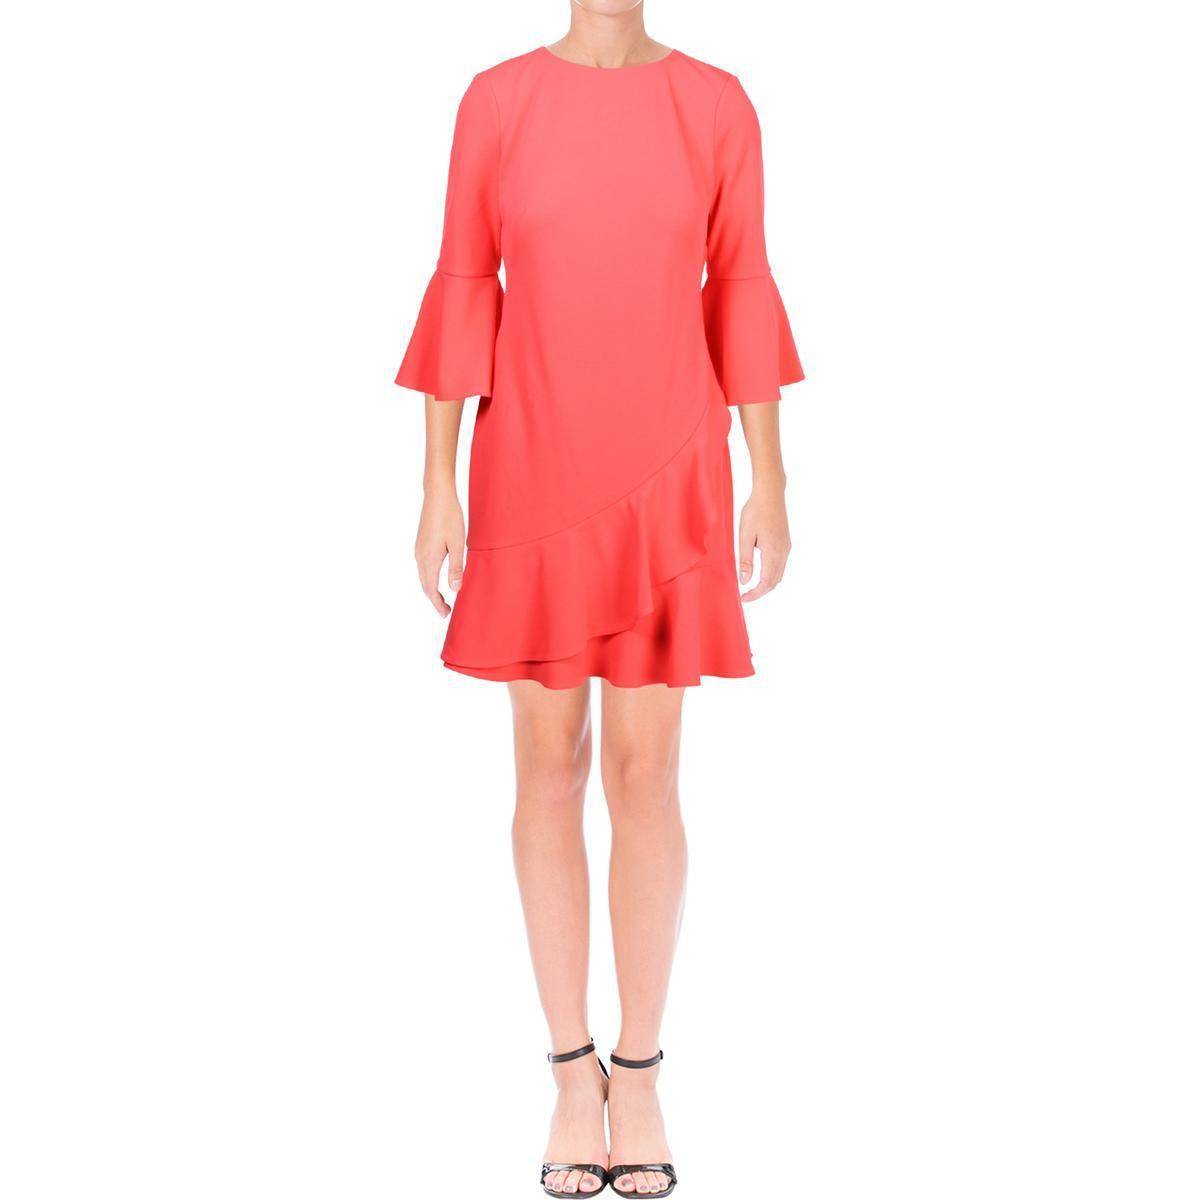 2d6301e5 Lyst - Lauren By Ralph Lauren Womens Tiered Mini Cocktail Dress in Pink